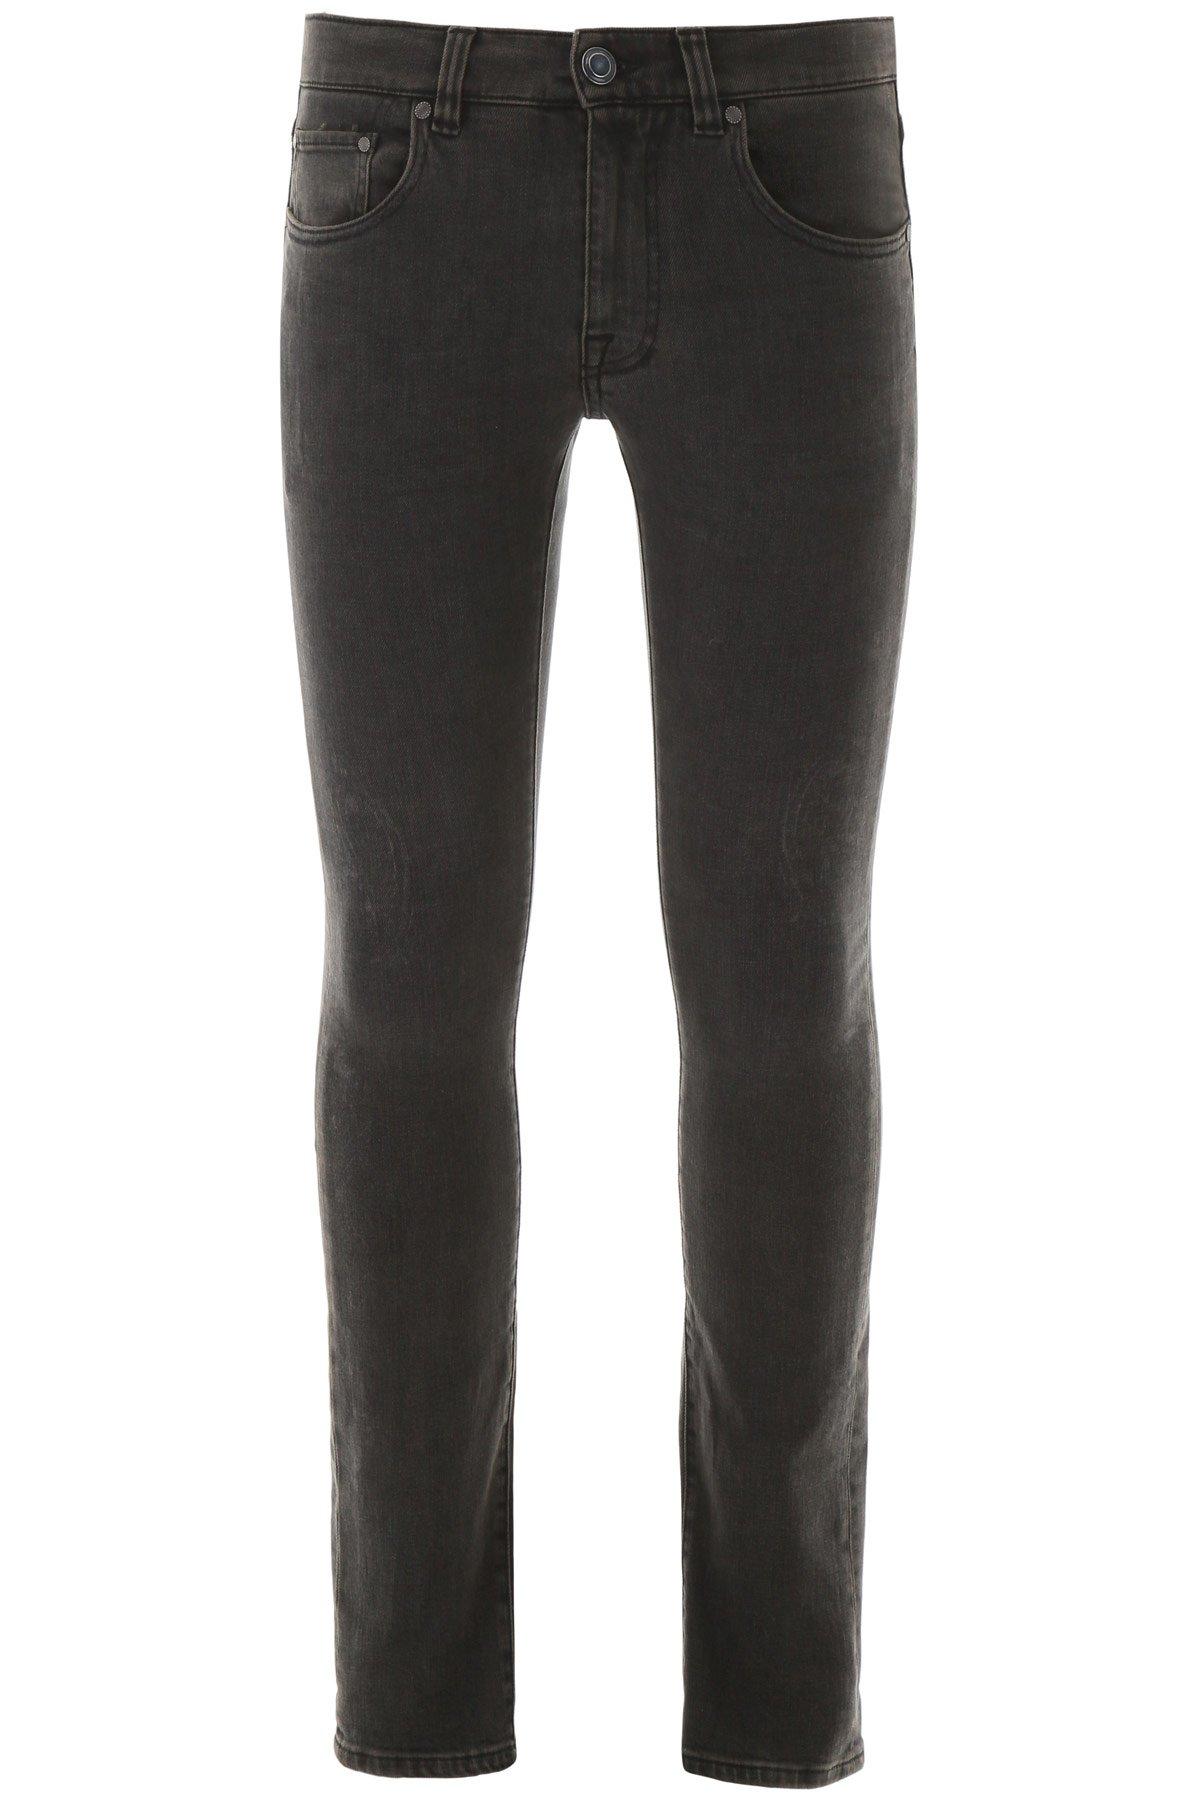 Etro jeans denim vintage